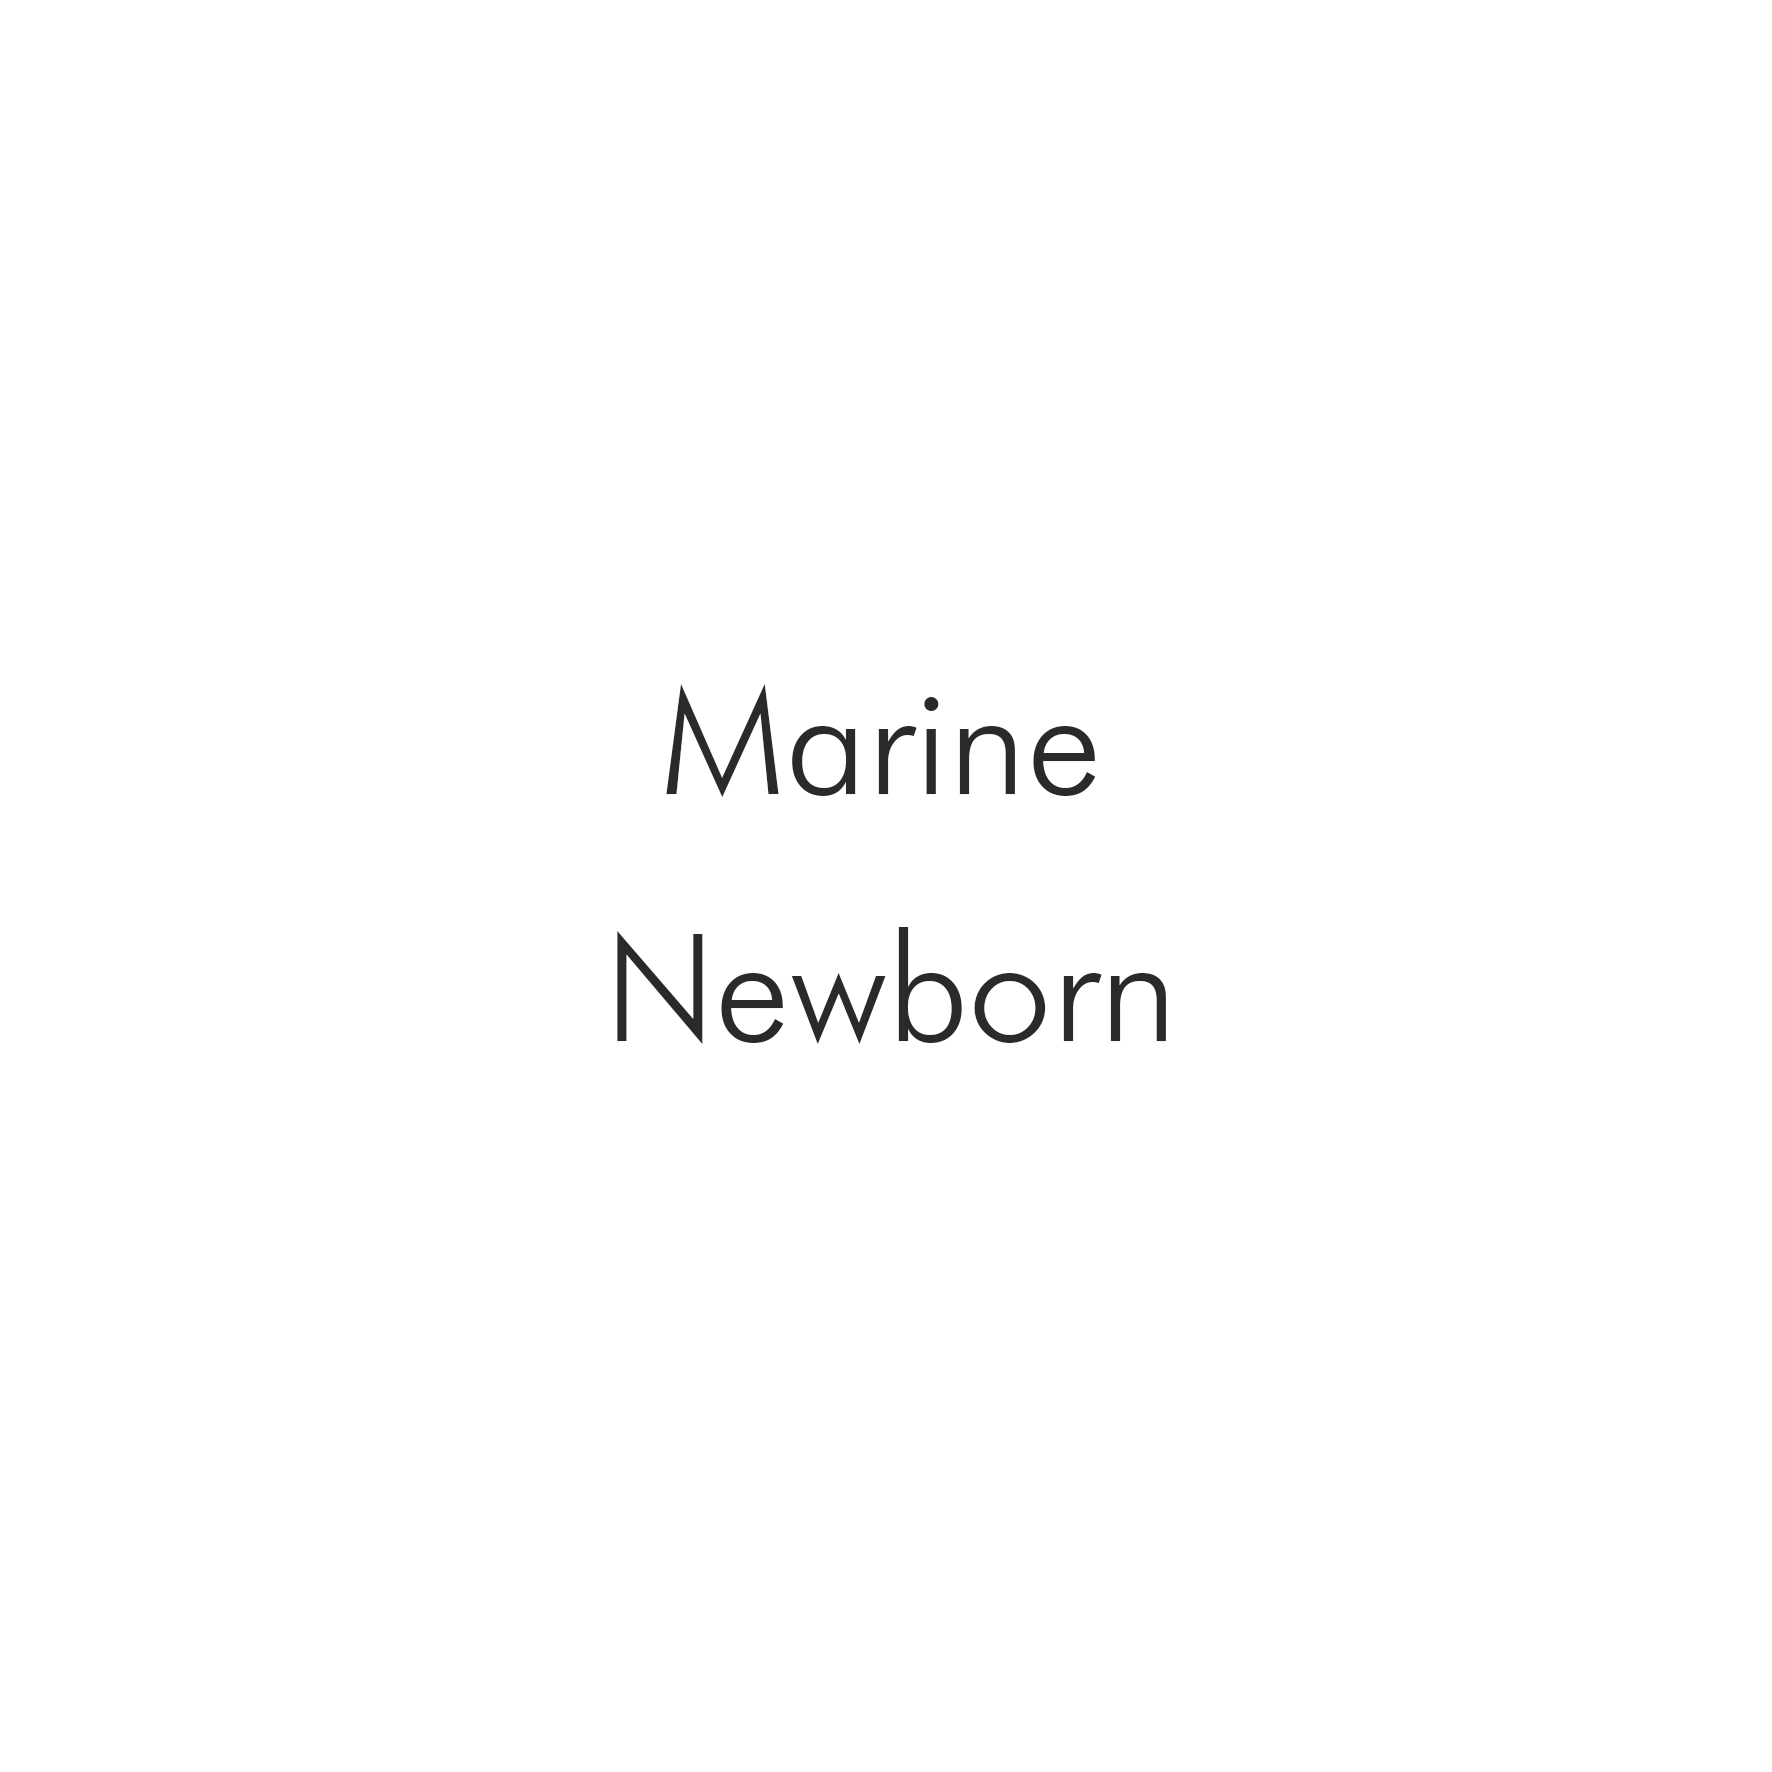 Marine Newborn.png